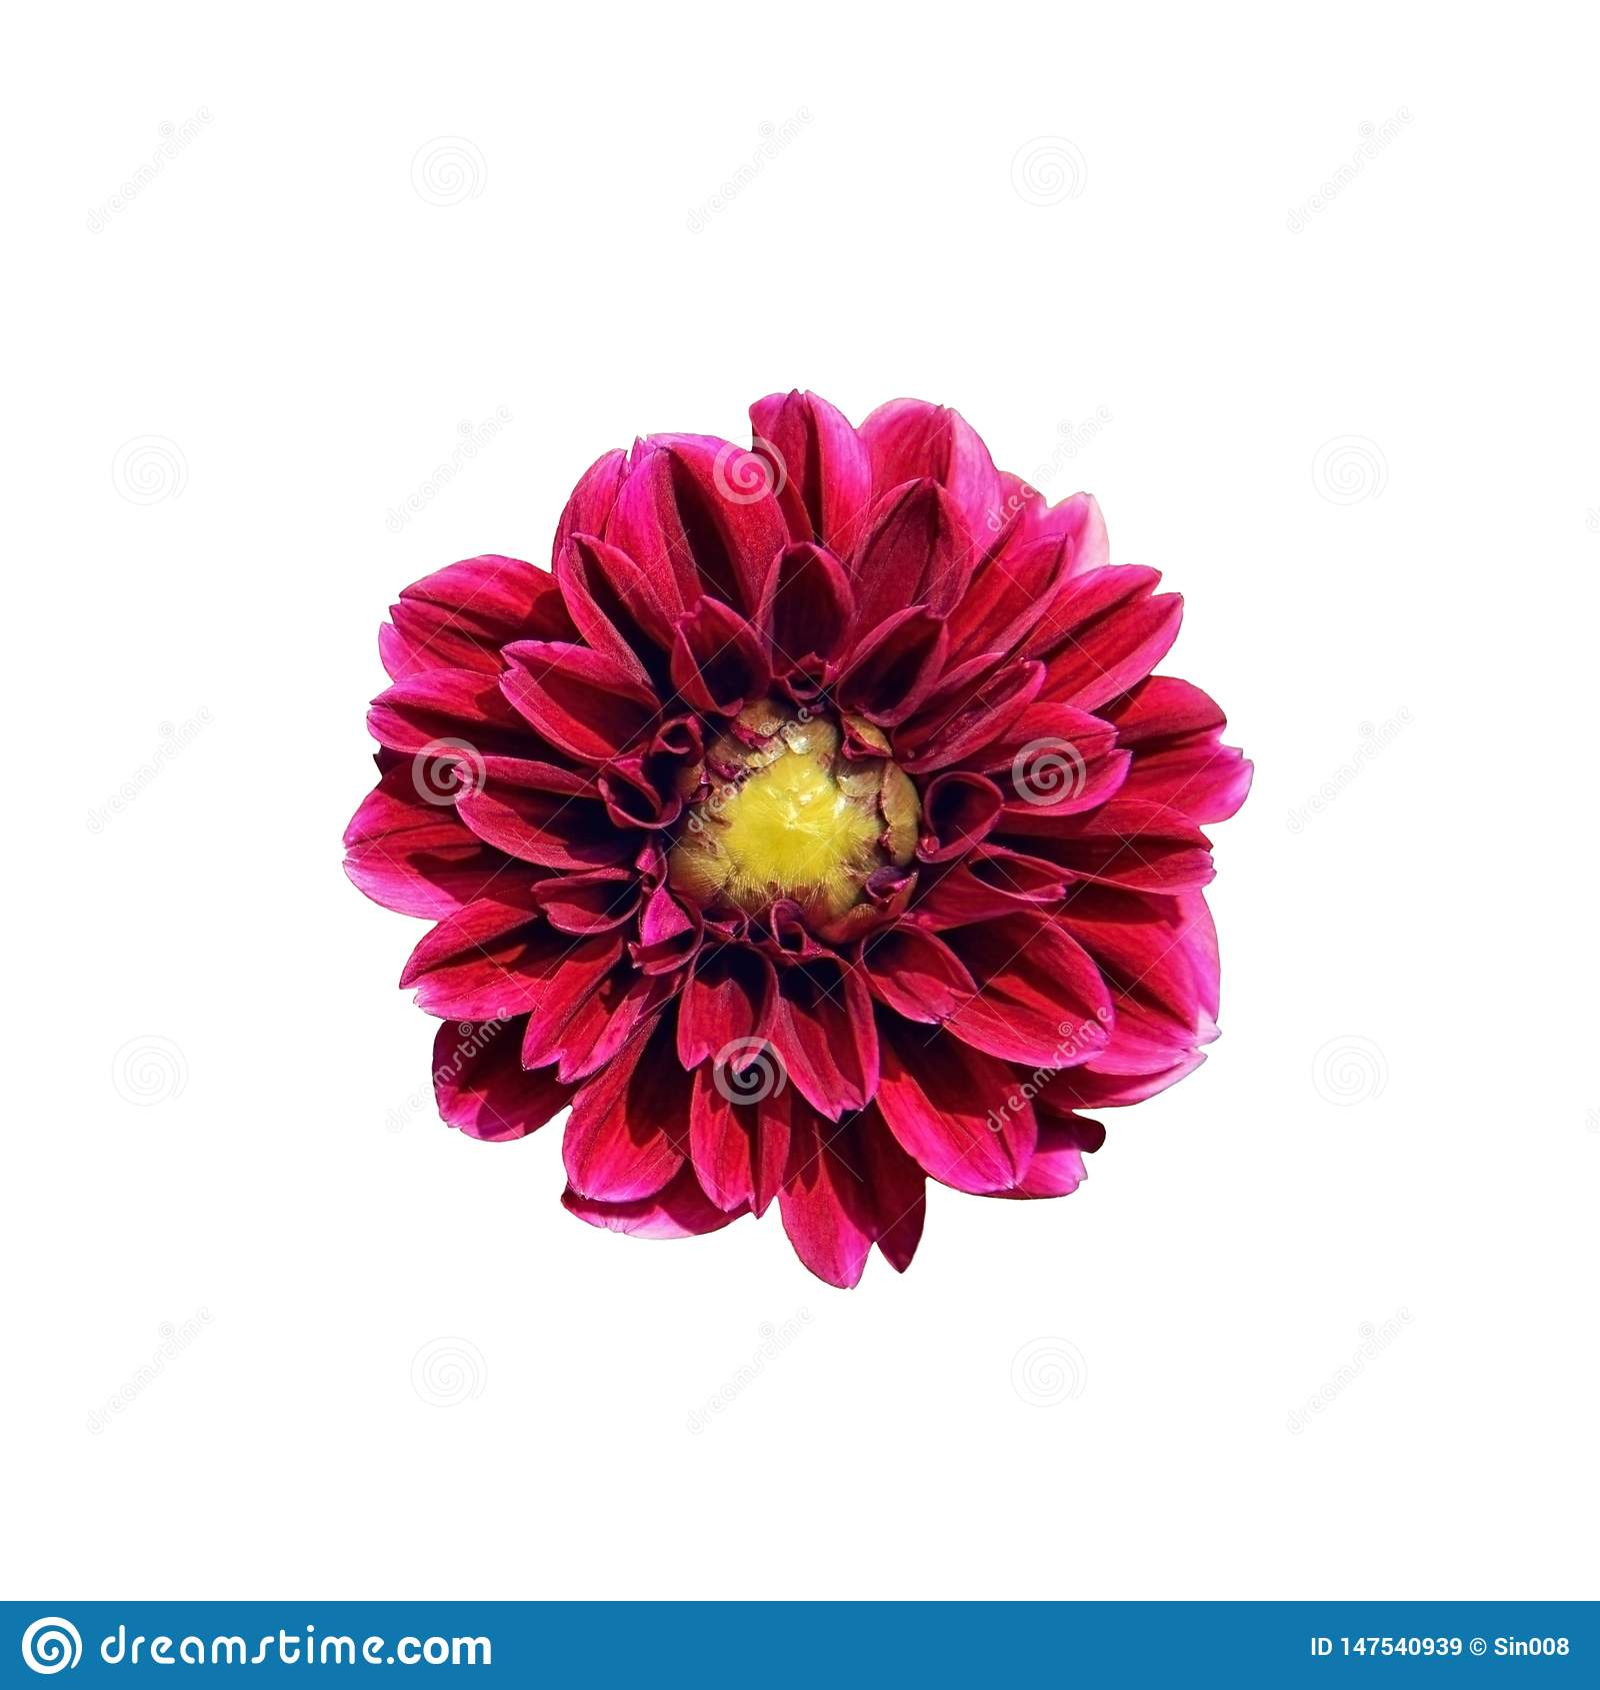 Kies heldere roze die Dahliabloem uit op witte achtergrond wordt ge?soleerd close-up, hoogste mening Een mooie purpere bloem met